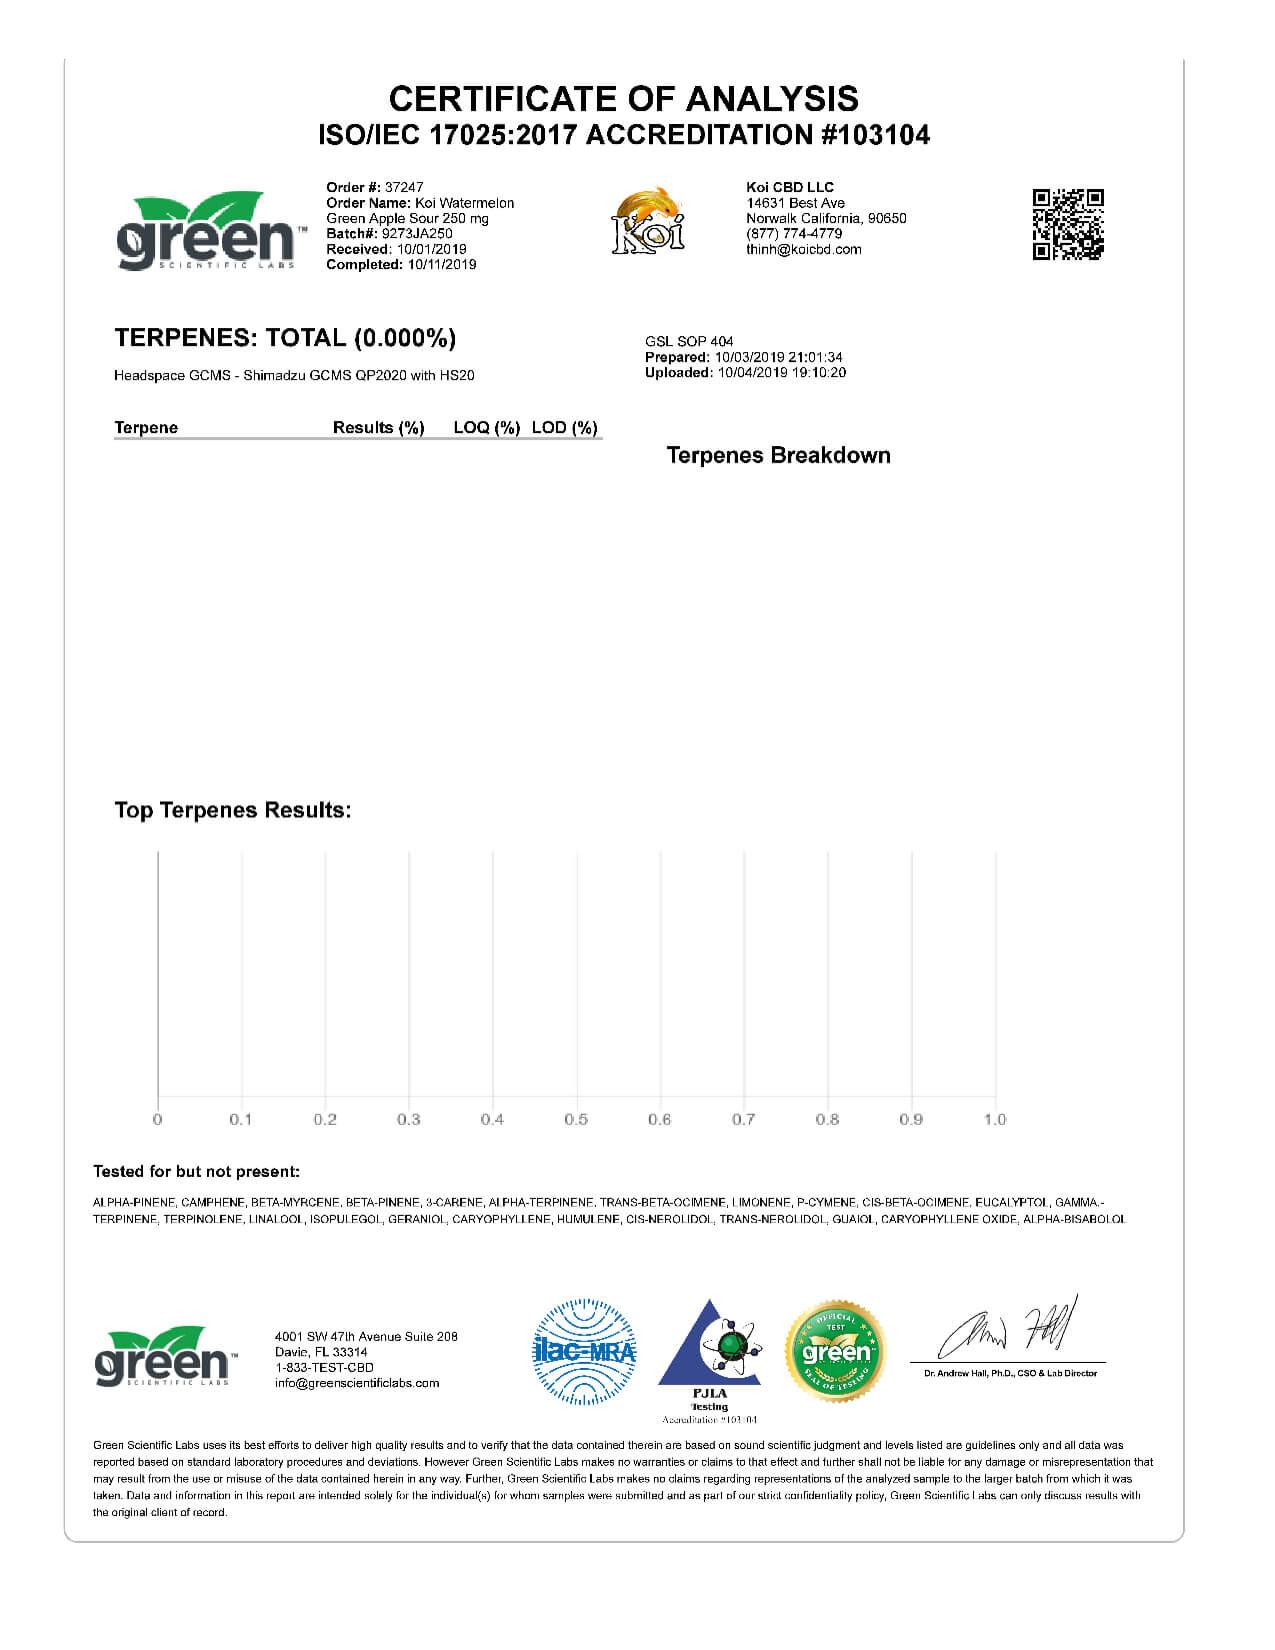 Koi CBD Watermelon Green Apple Sour Vape Oil 250mg page2